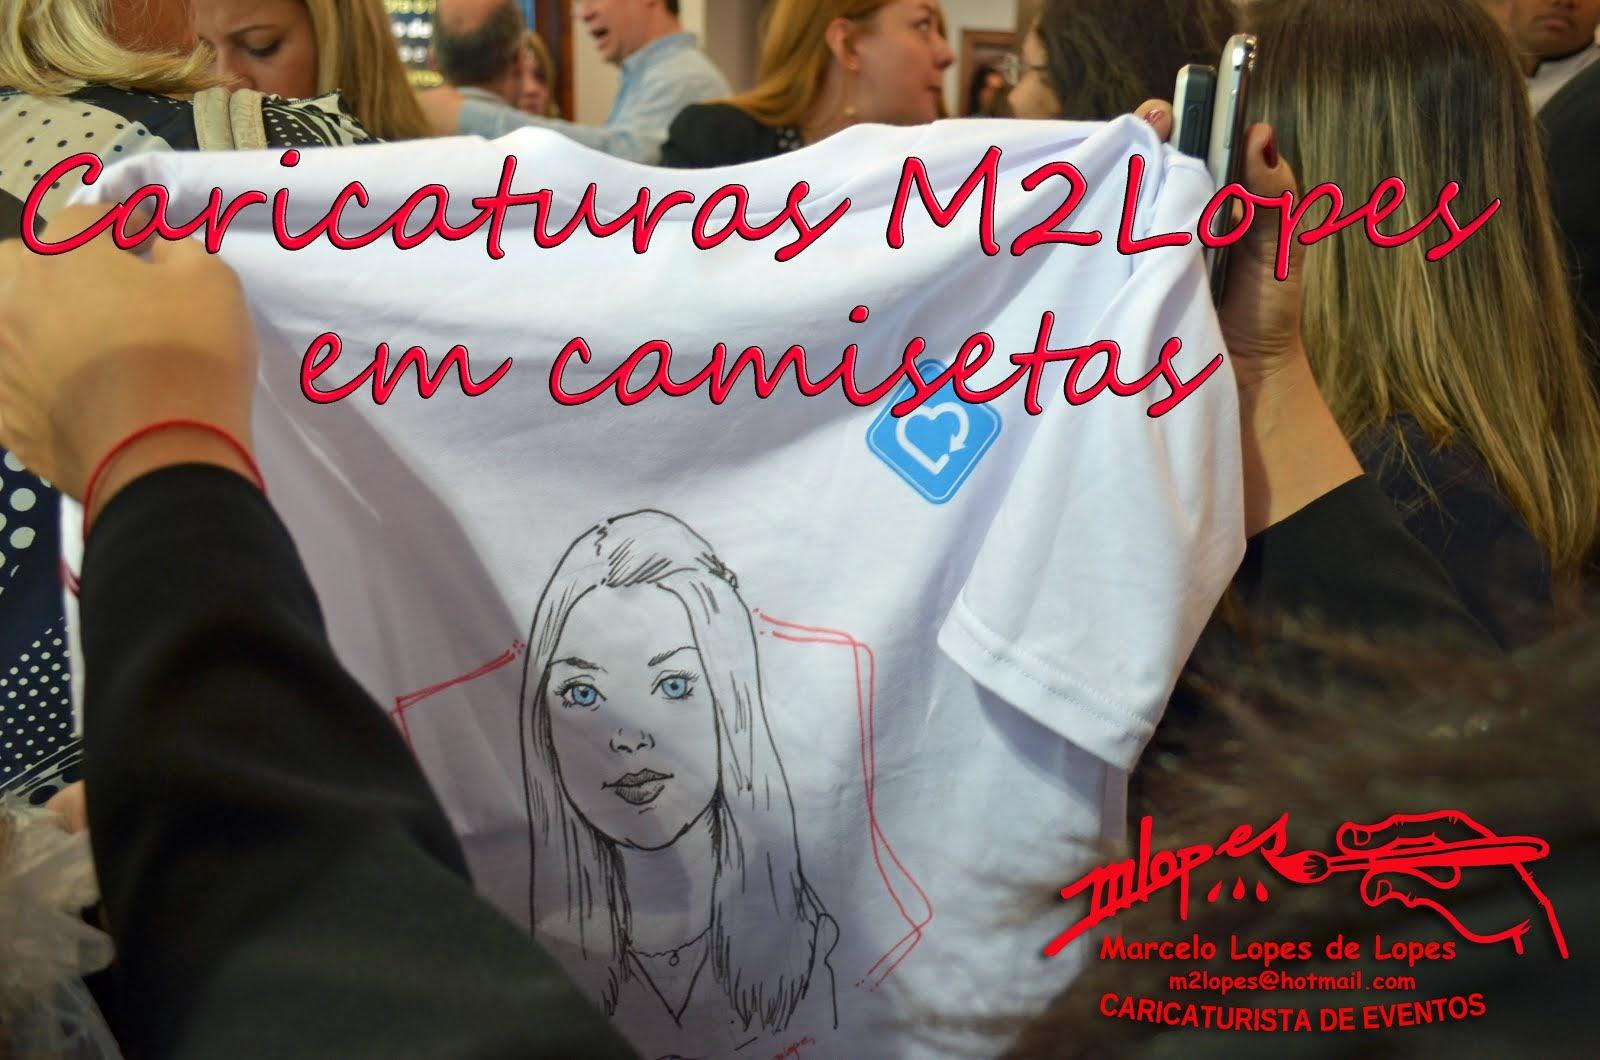 Caricaturas direto em camisetas